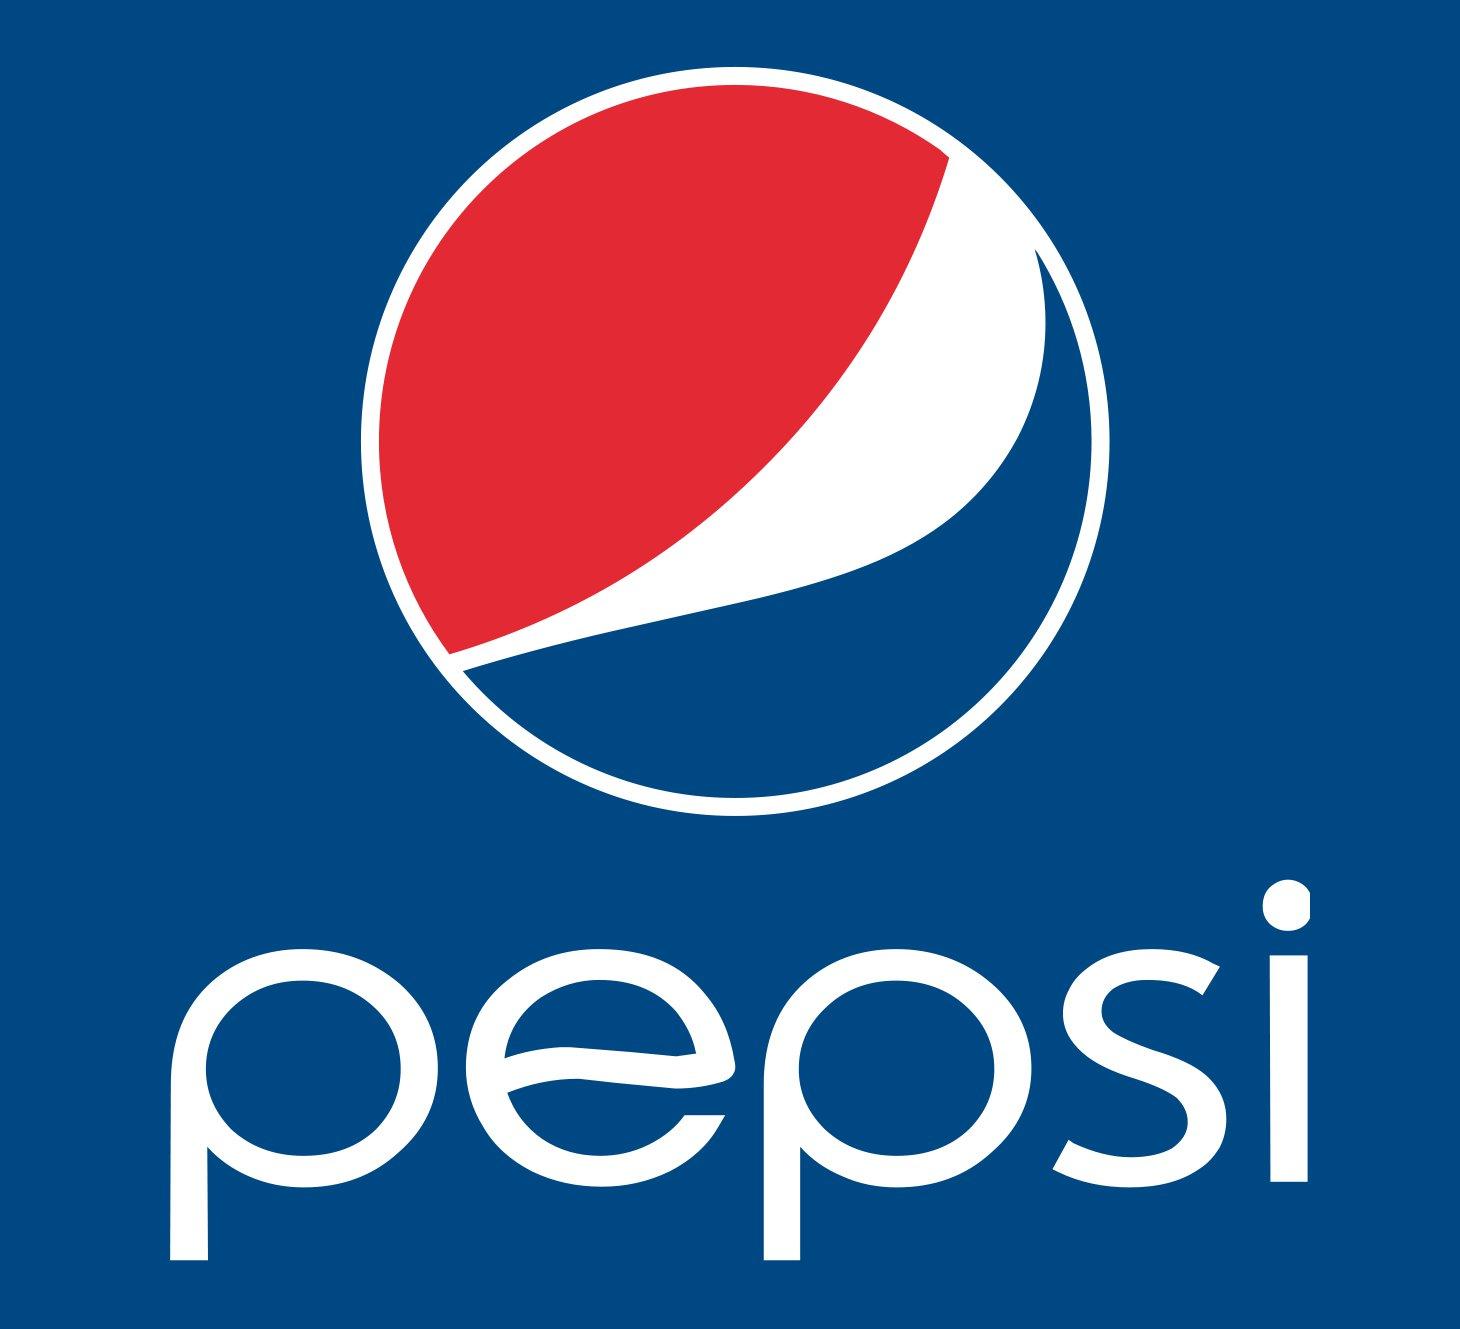 Pepsi logo pepsi symbol meaning history and evolution new pepsi logo buycottarizona